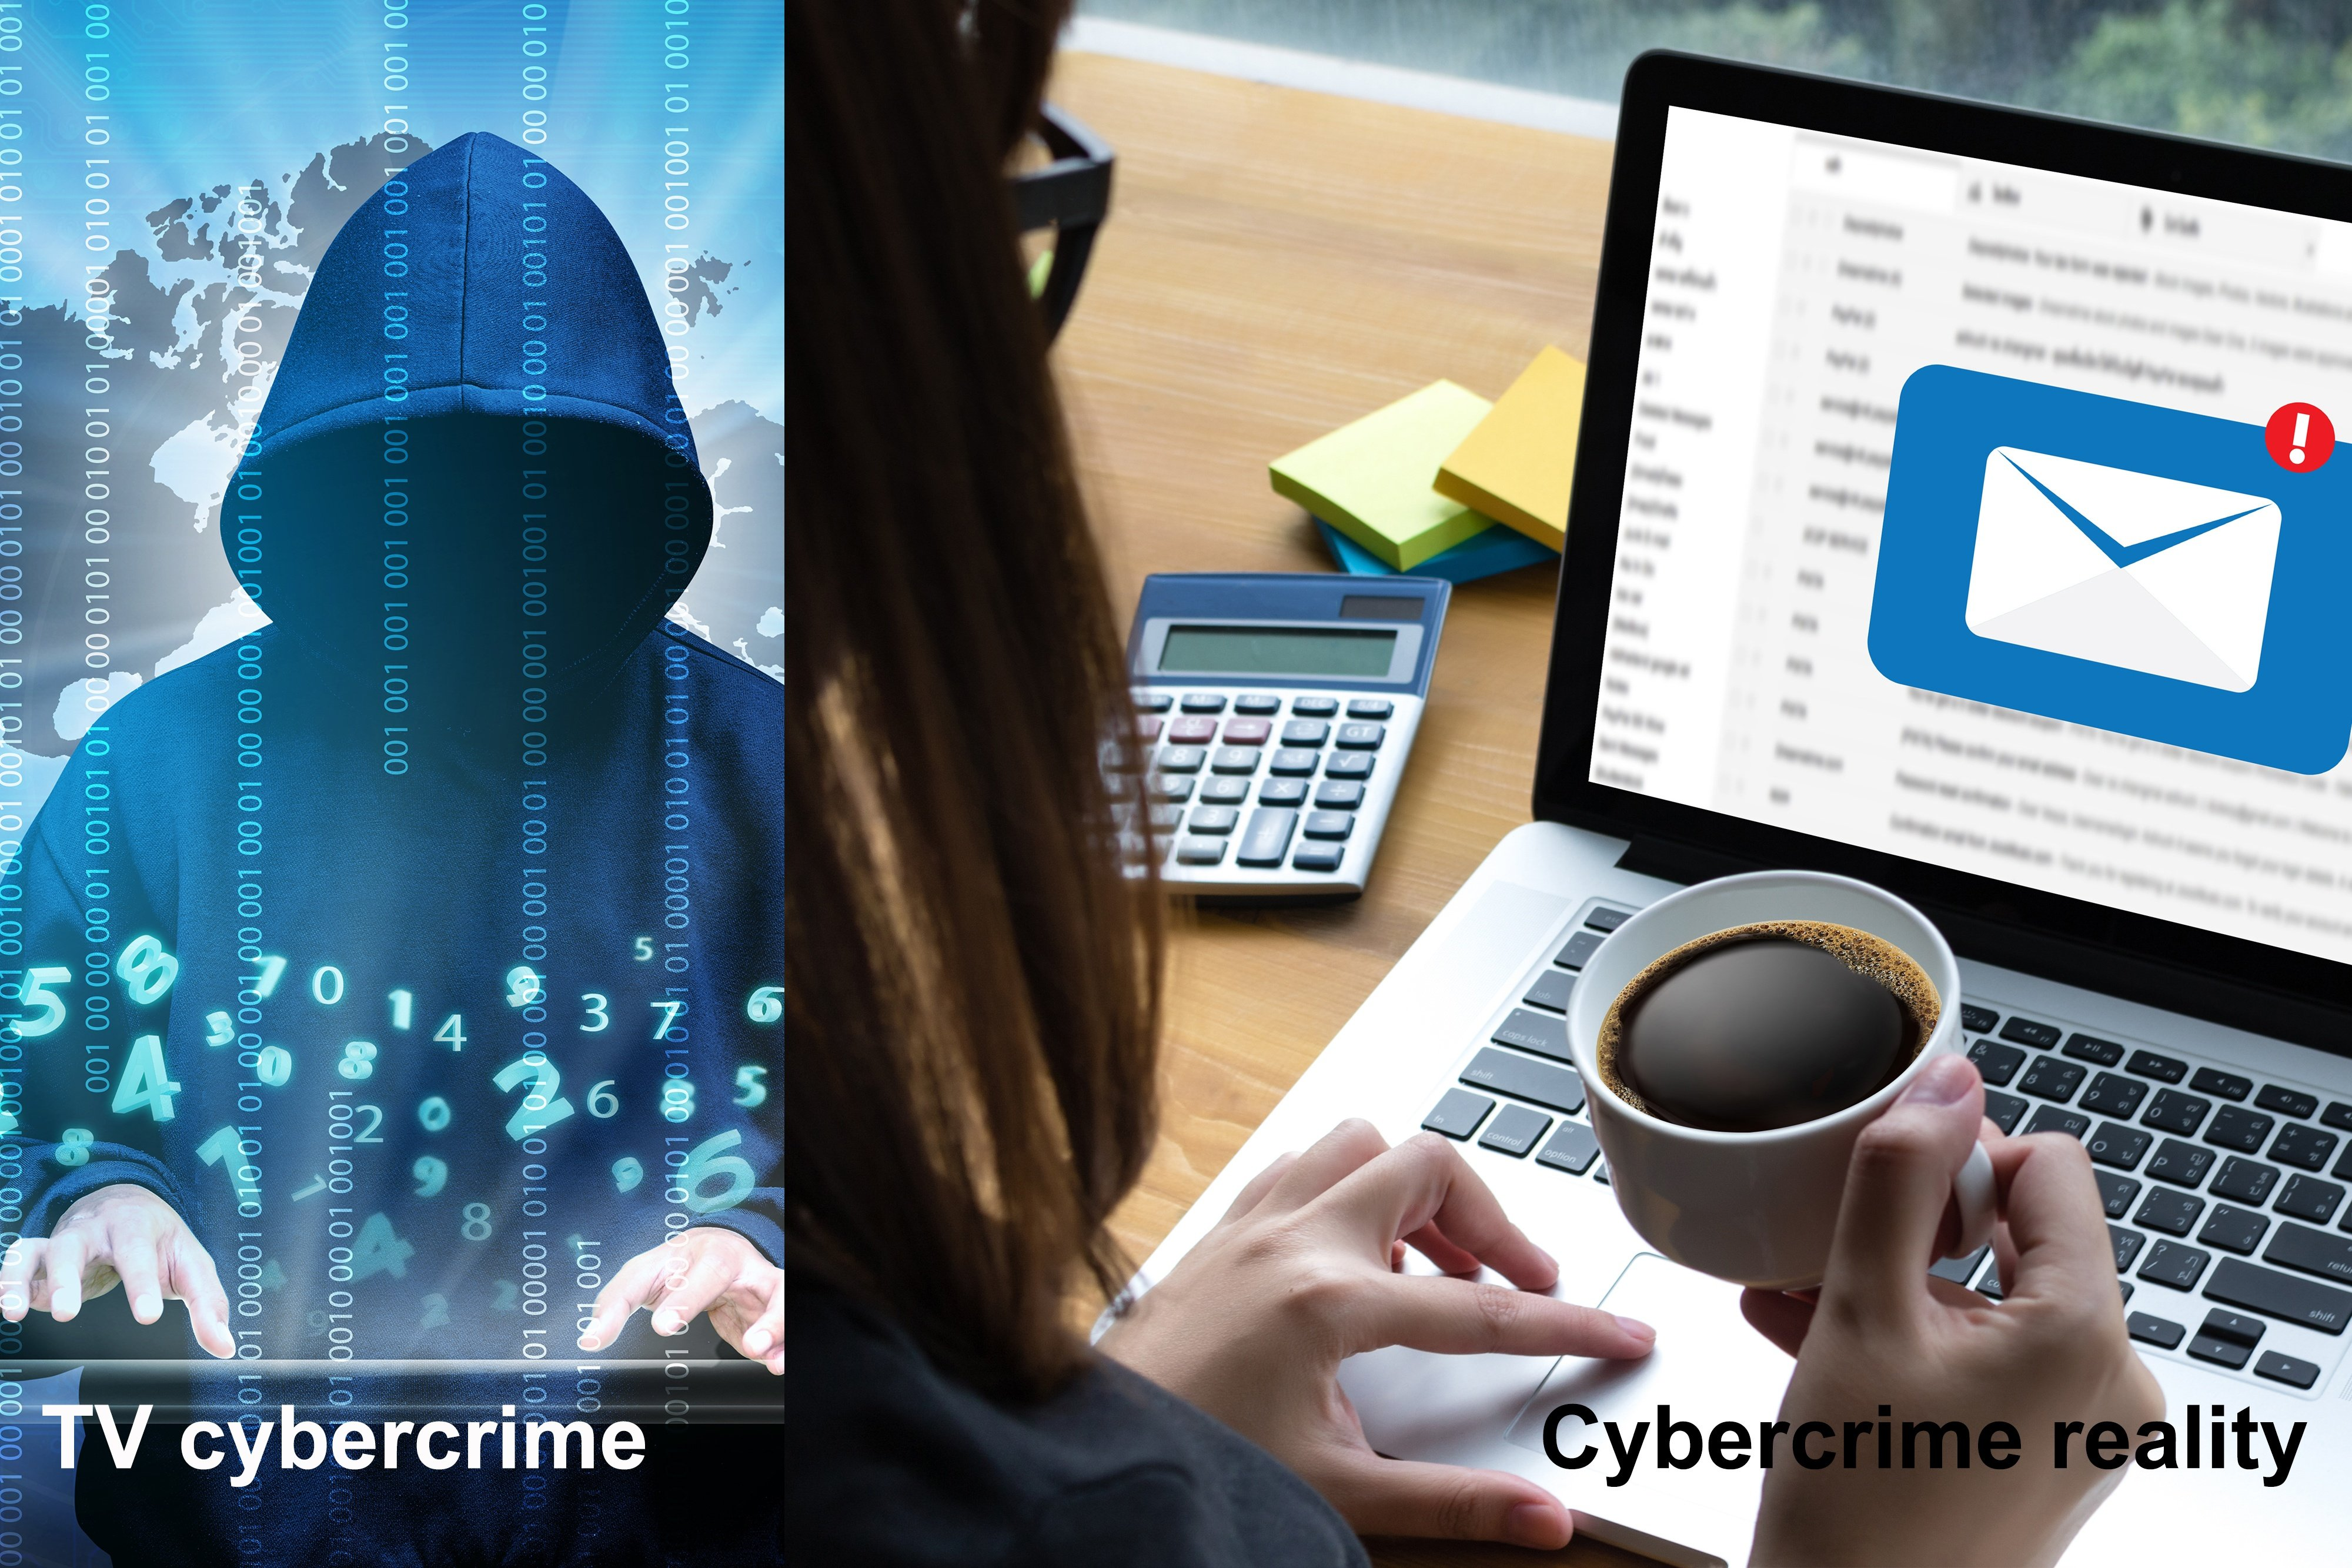 tv-cybercrime-vs-real